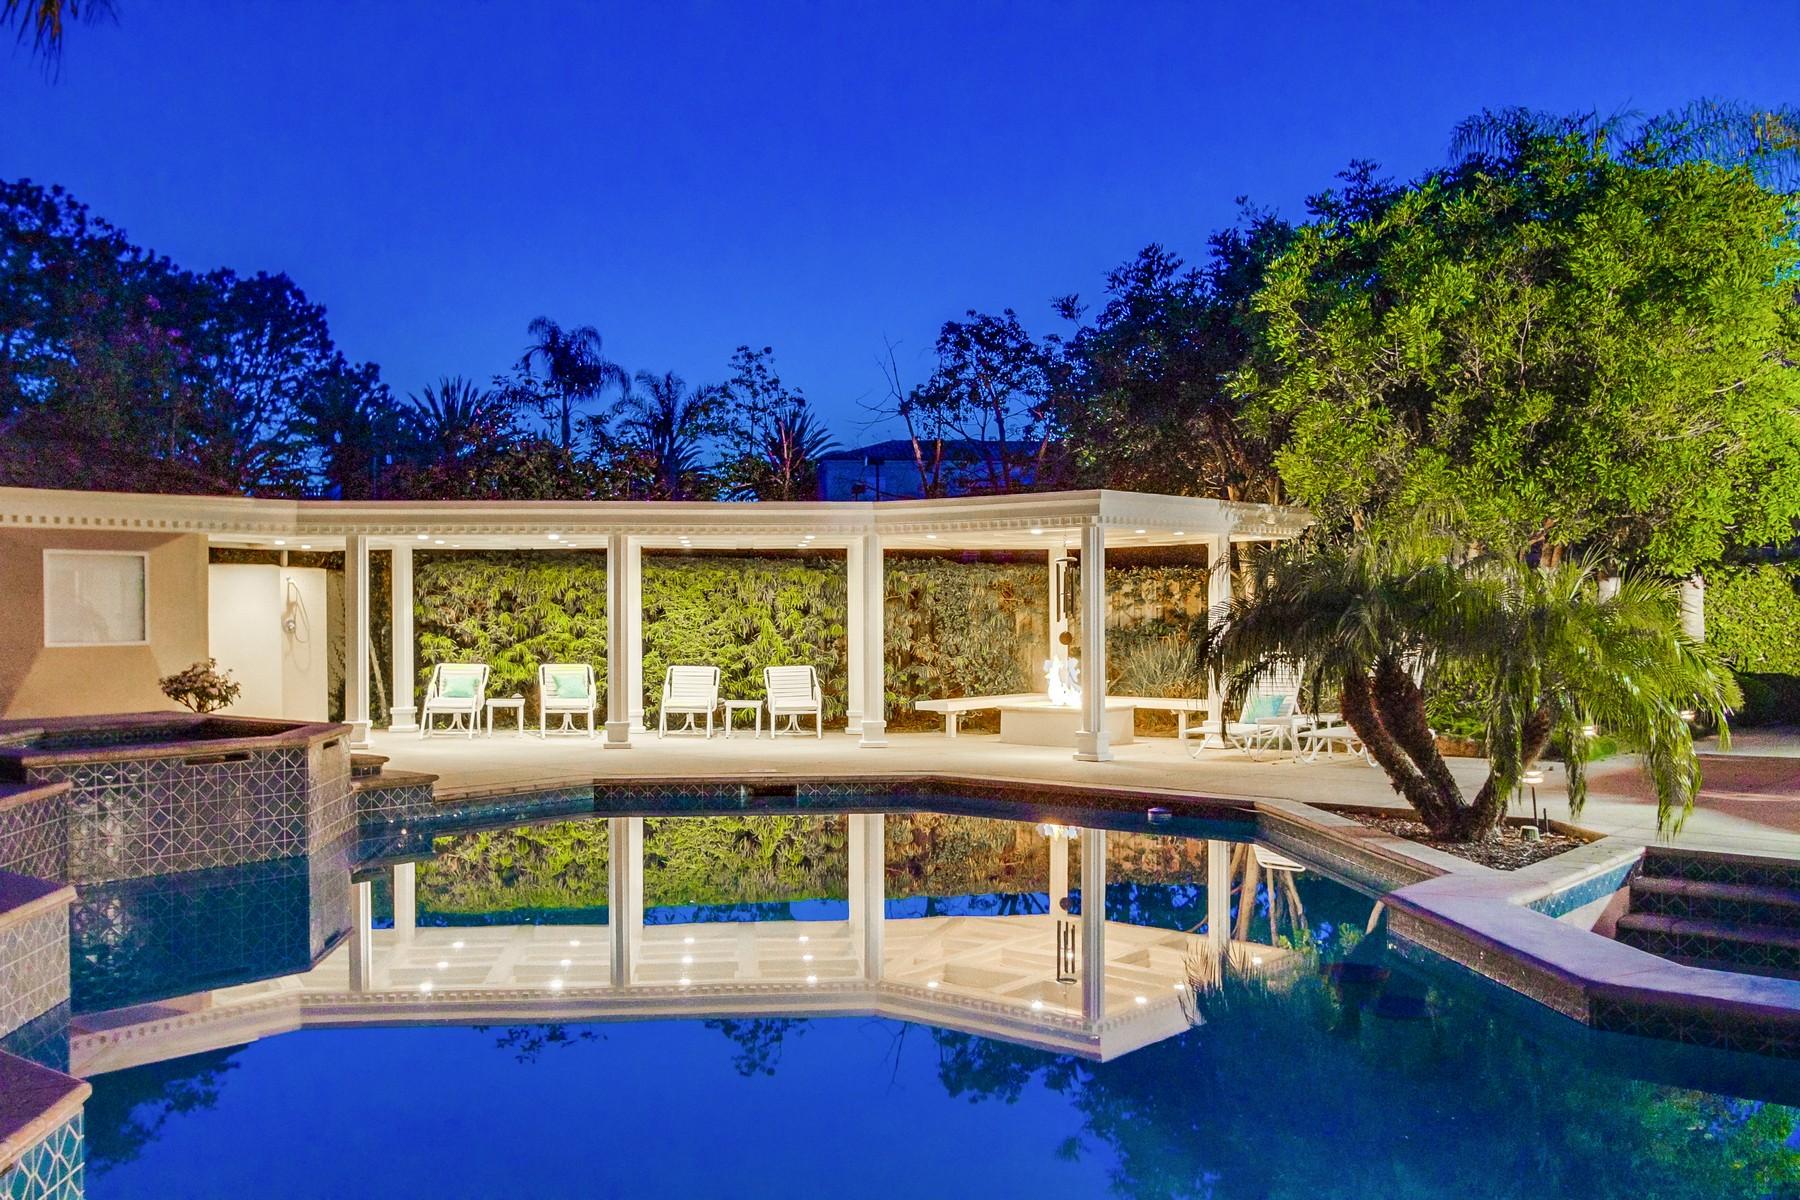 Additional photo for property listing at 9814 Black Gold Road  La Jolla, Калифорния 92037 Соединенные Штаты